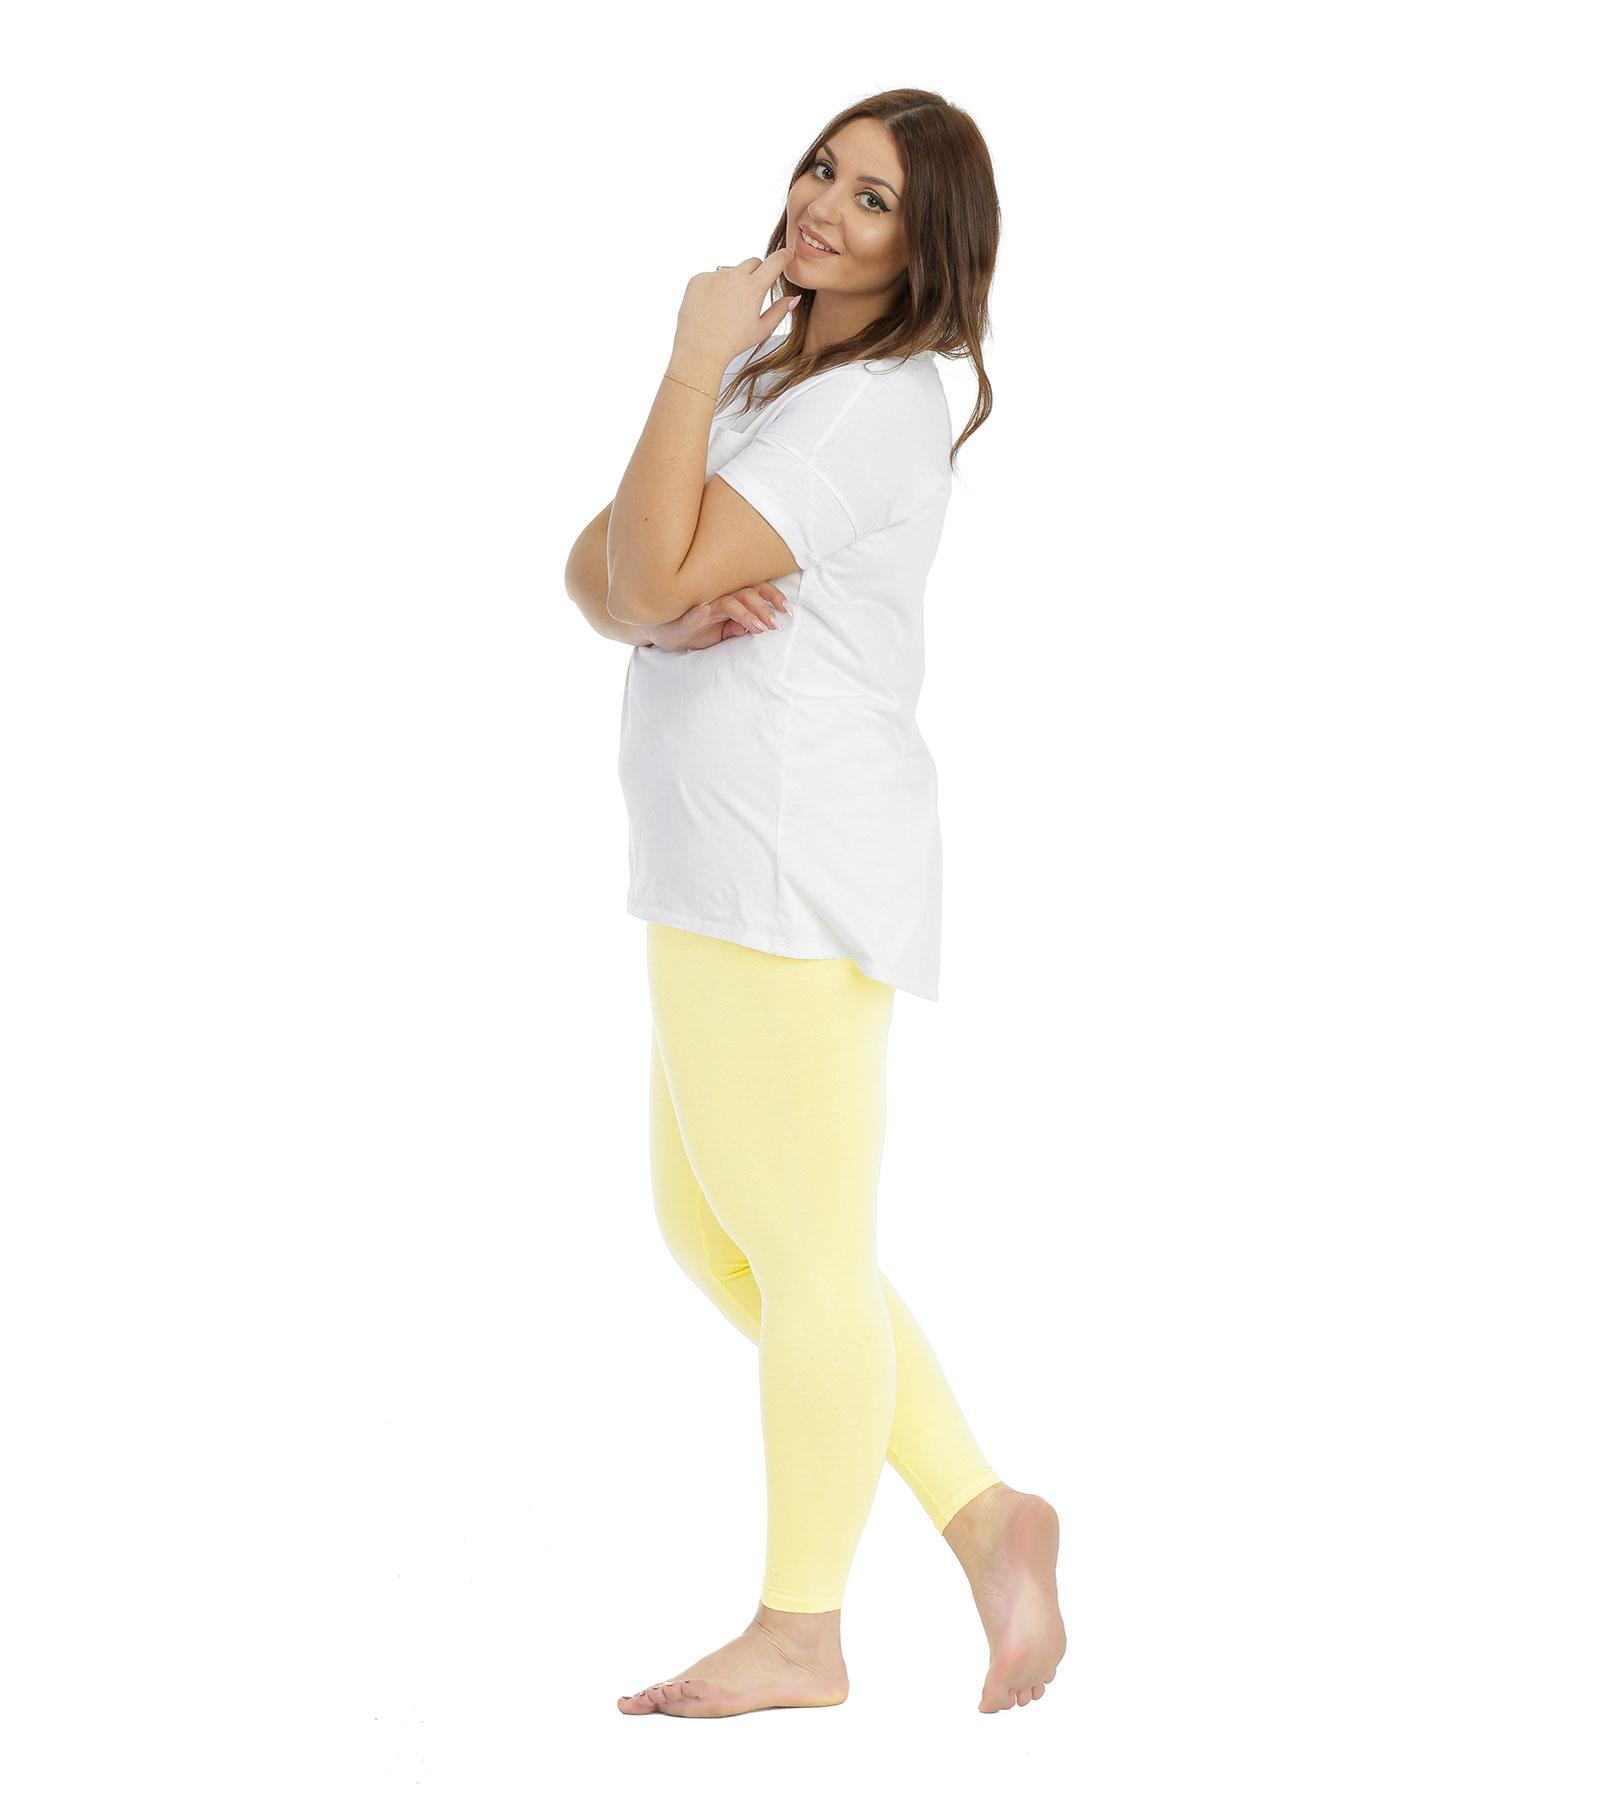 Legginsy damskie żółte plus size Bensini®